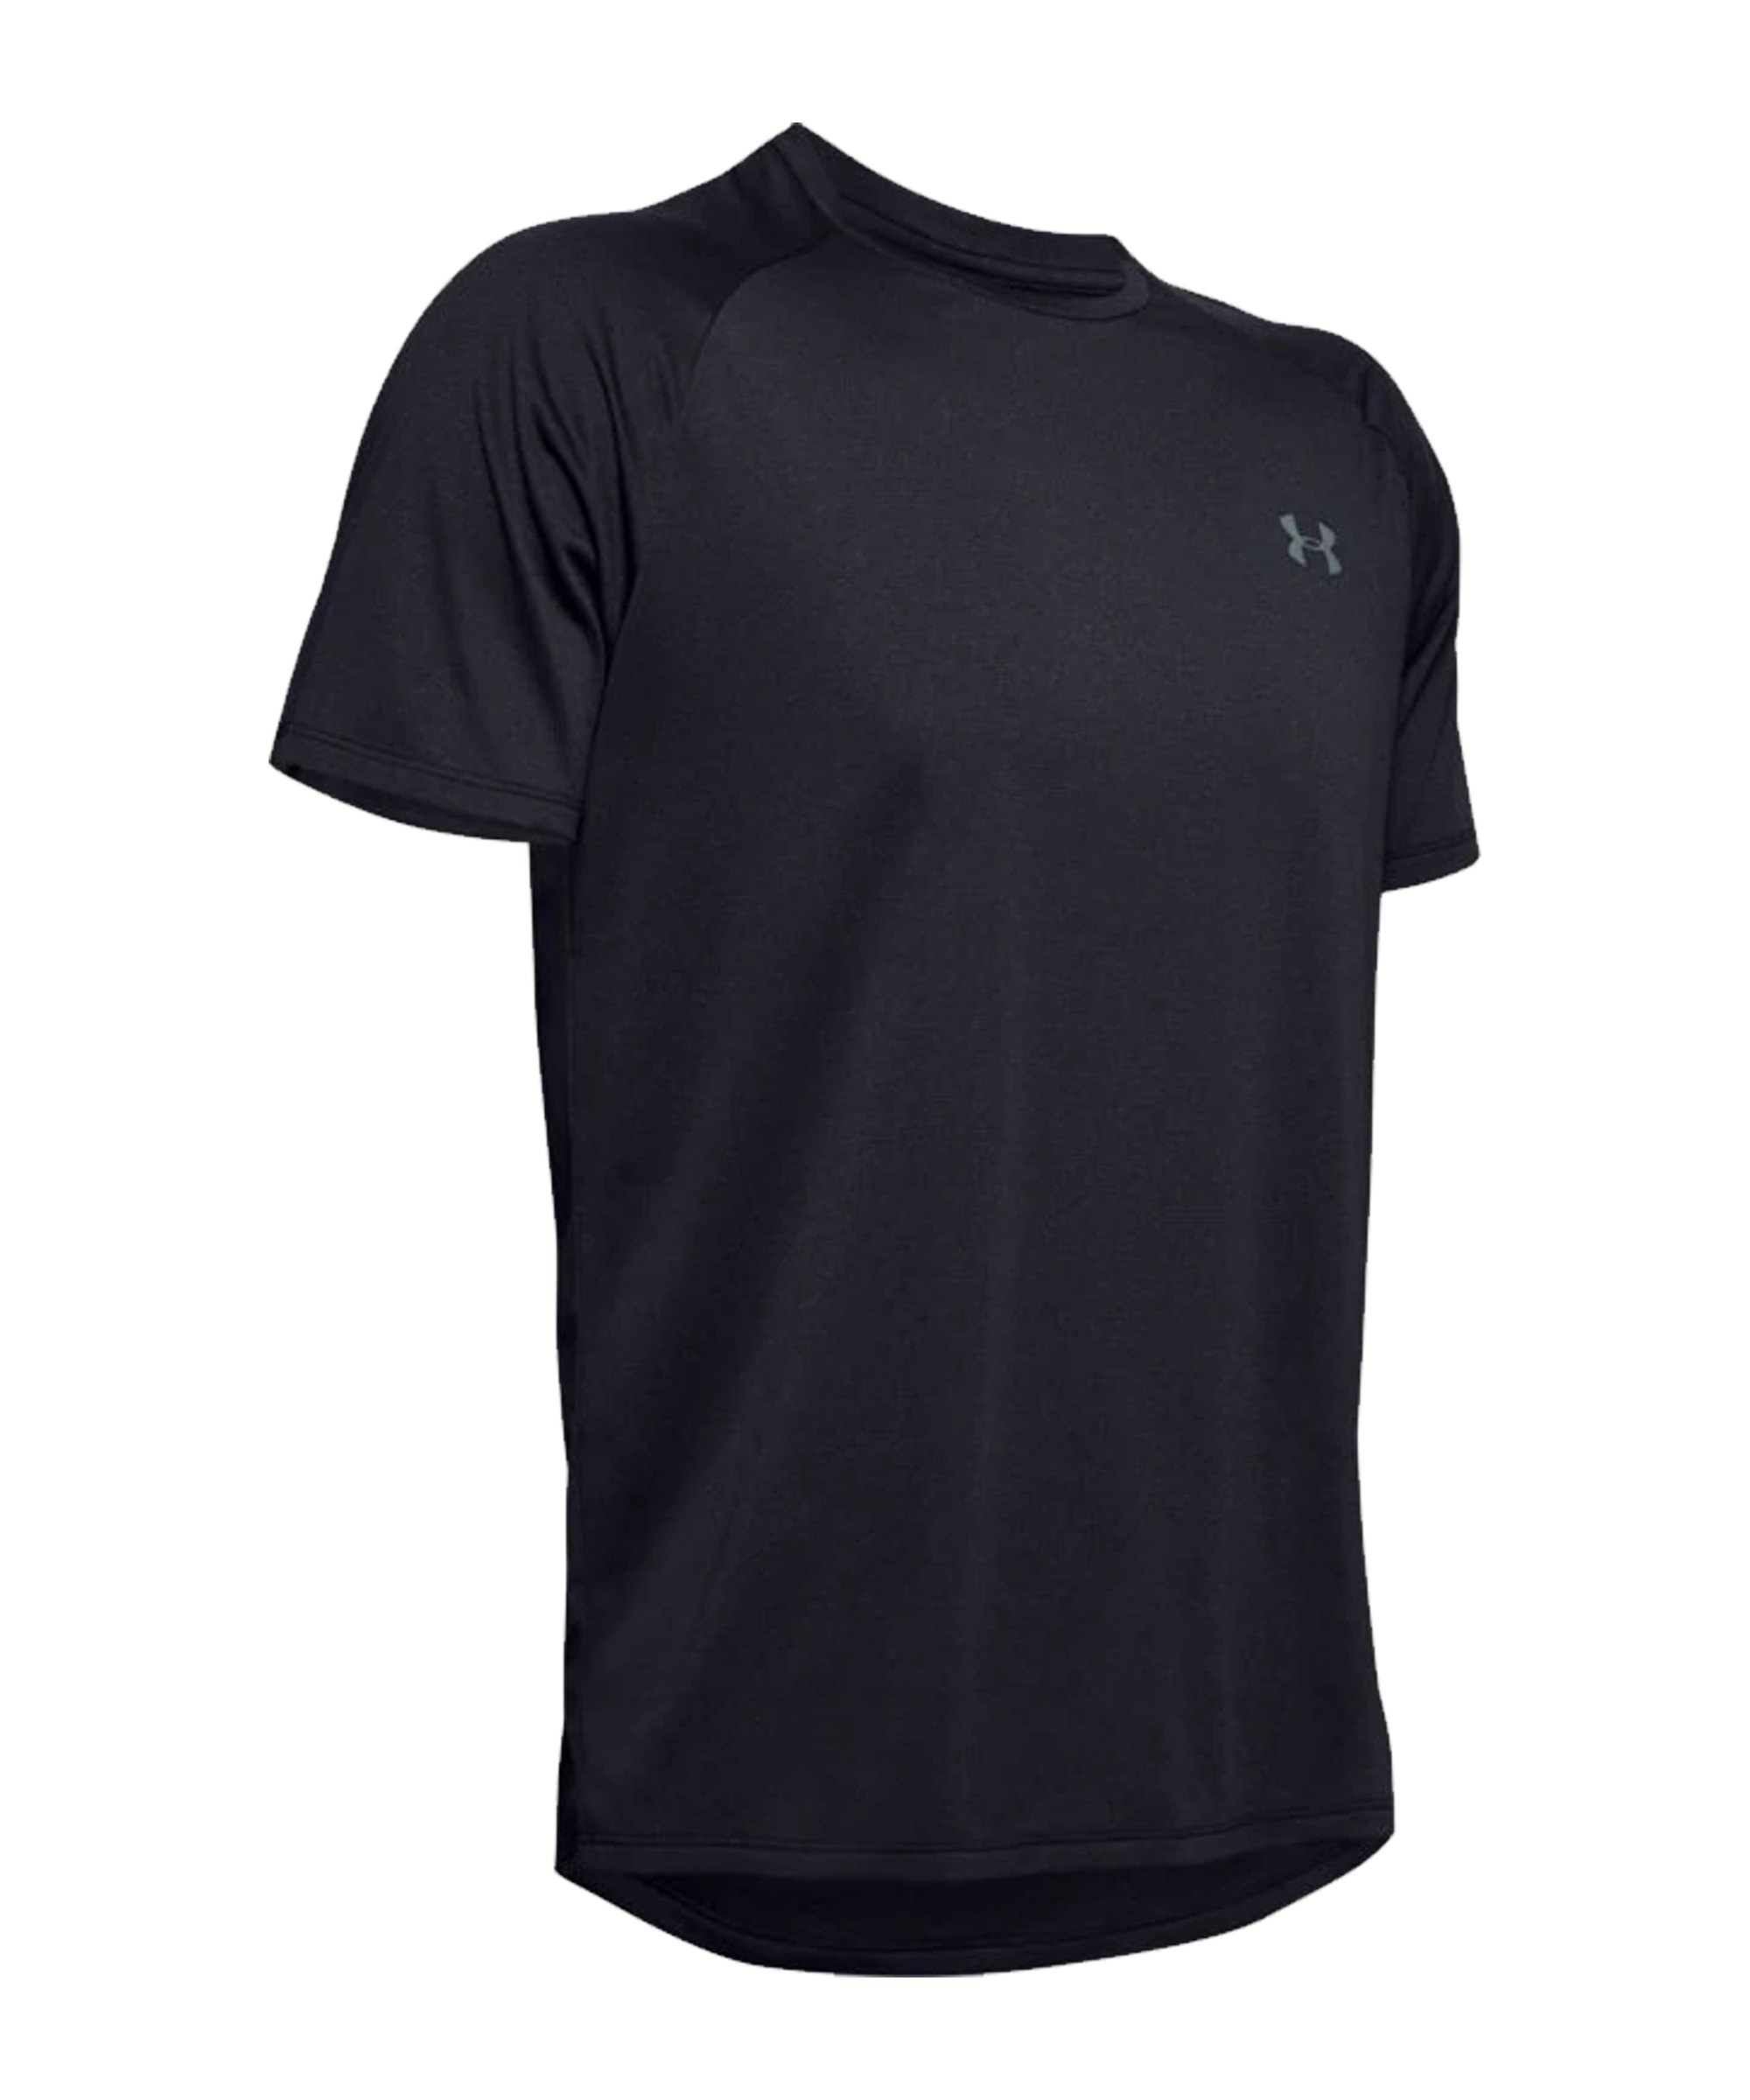 Under Armour Tech 2.0 Tee T-Shirt Schwarz F001 - schwarz